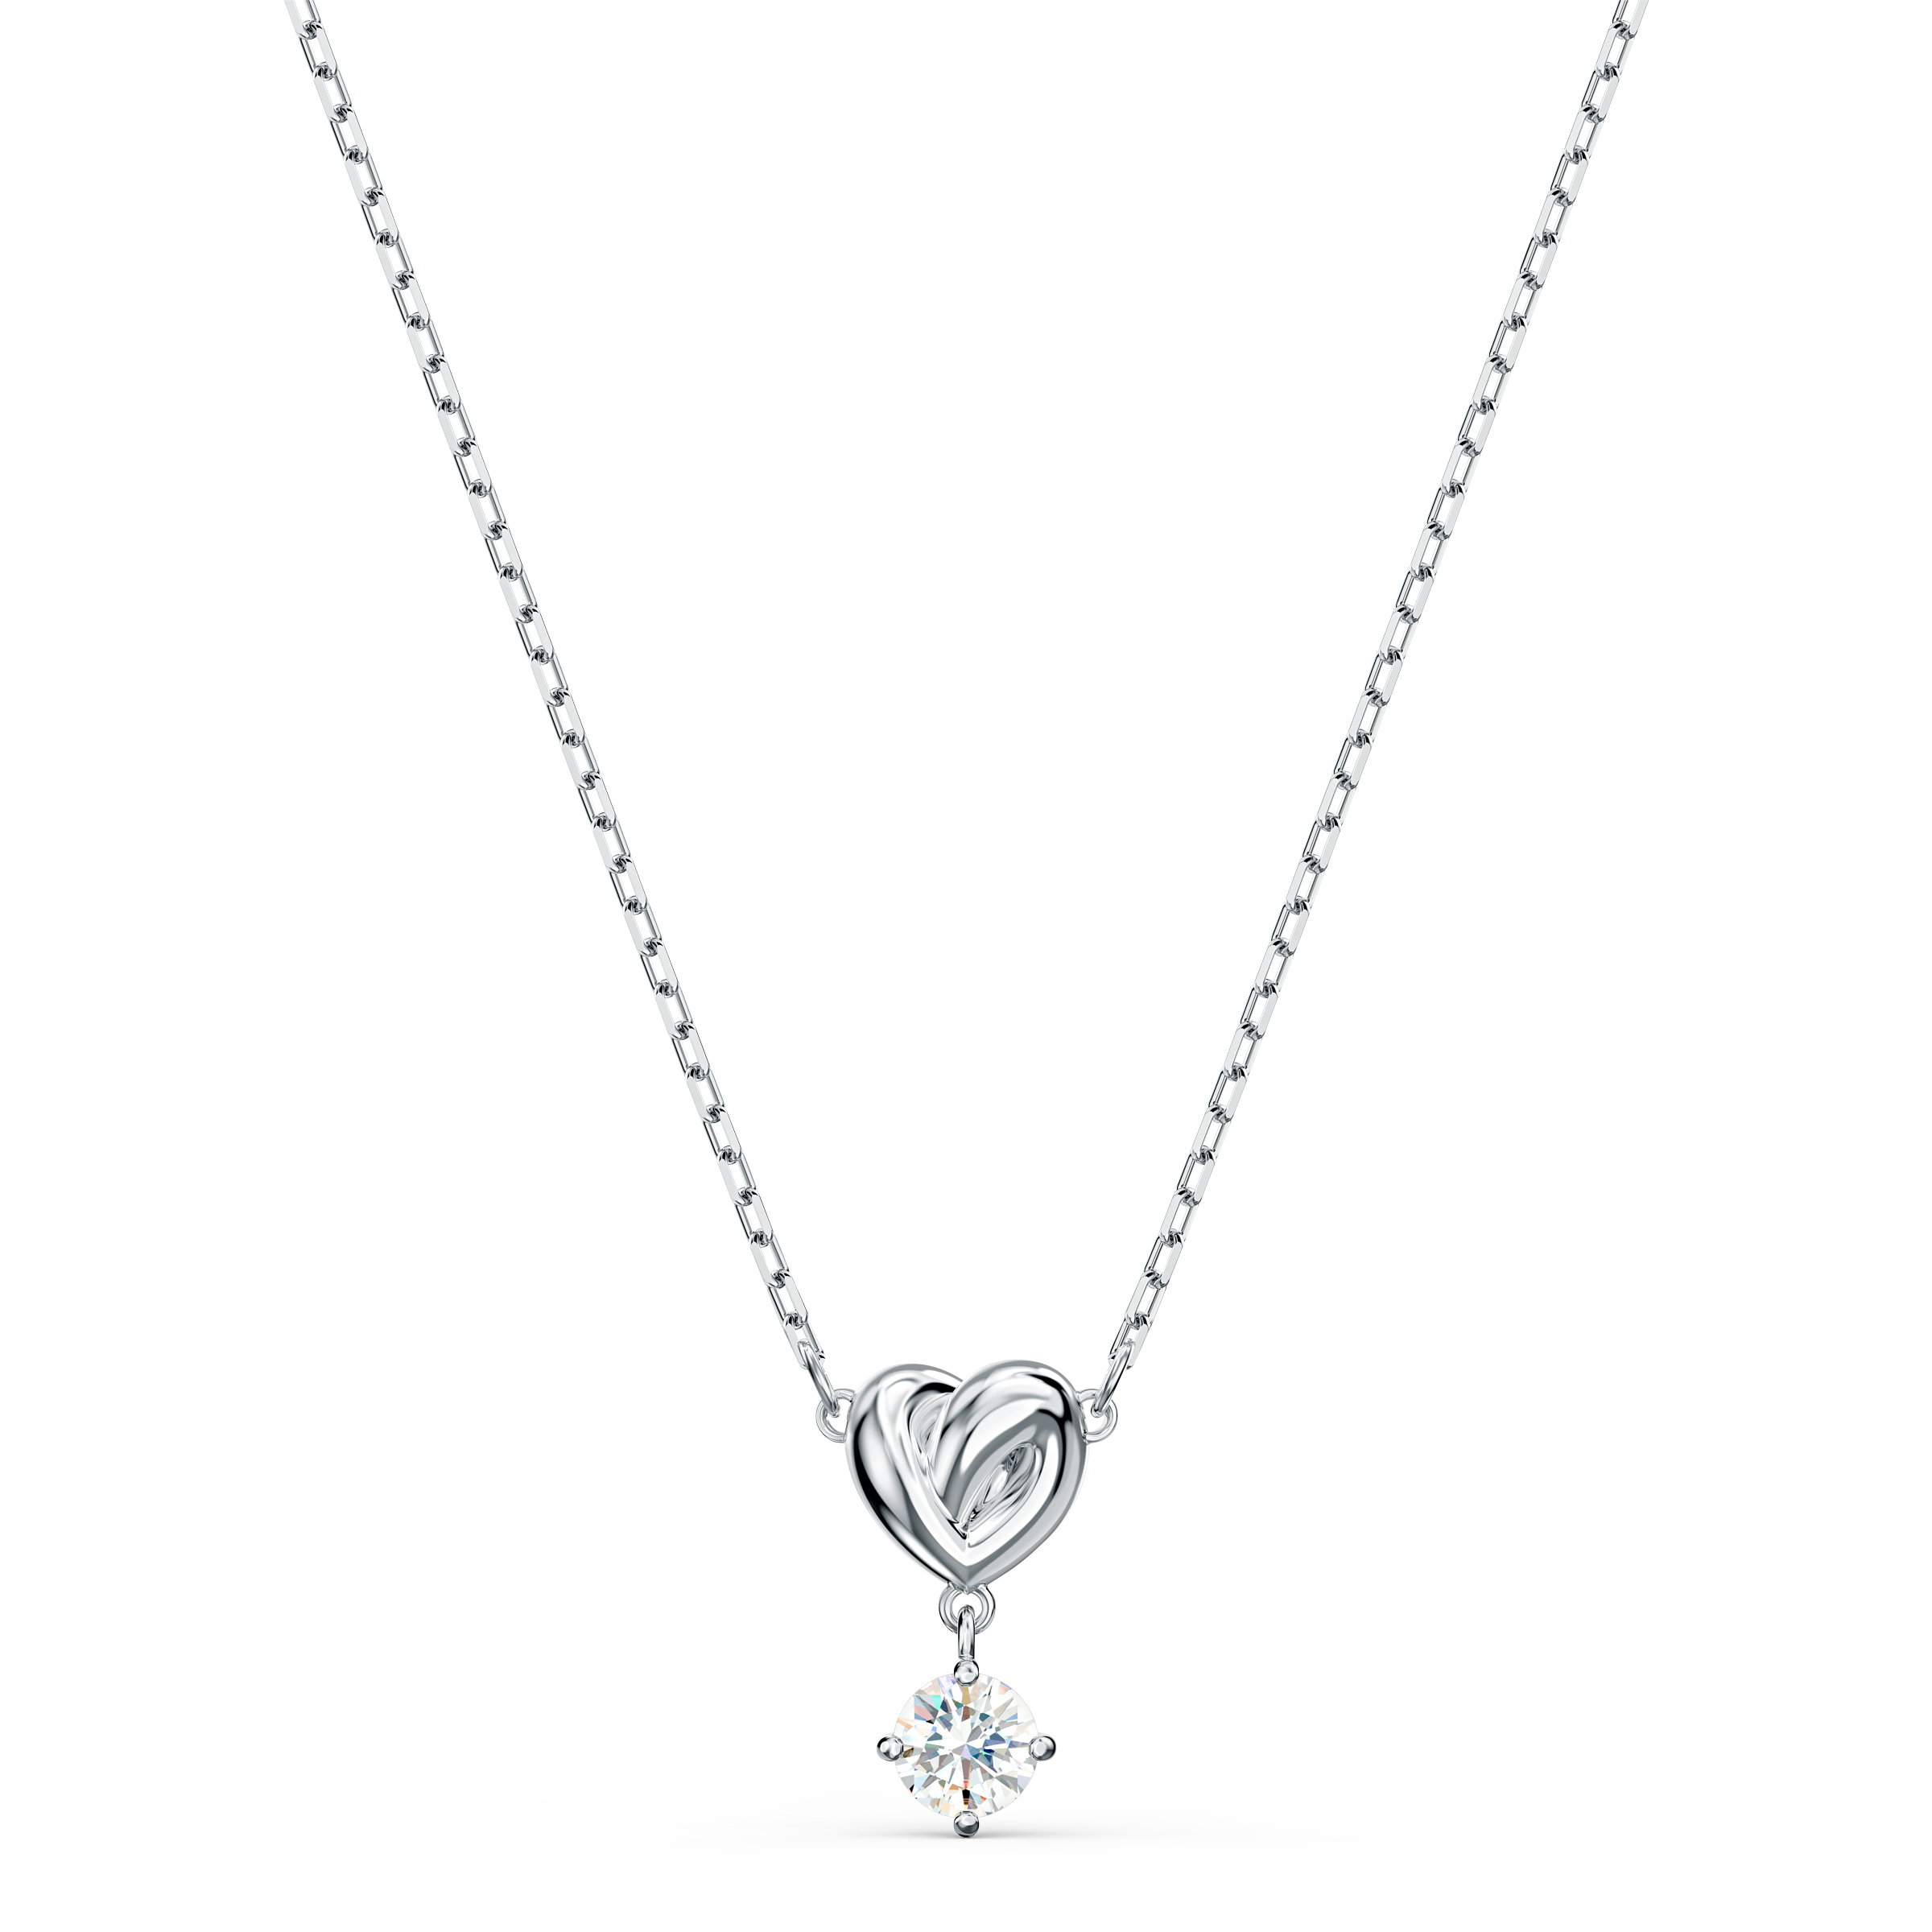 Pendentif Lifelong Heart, blanc, métal rhodié Swarovski